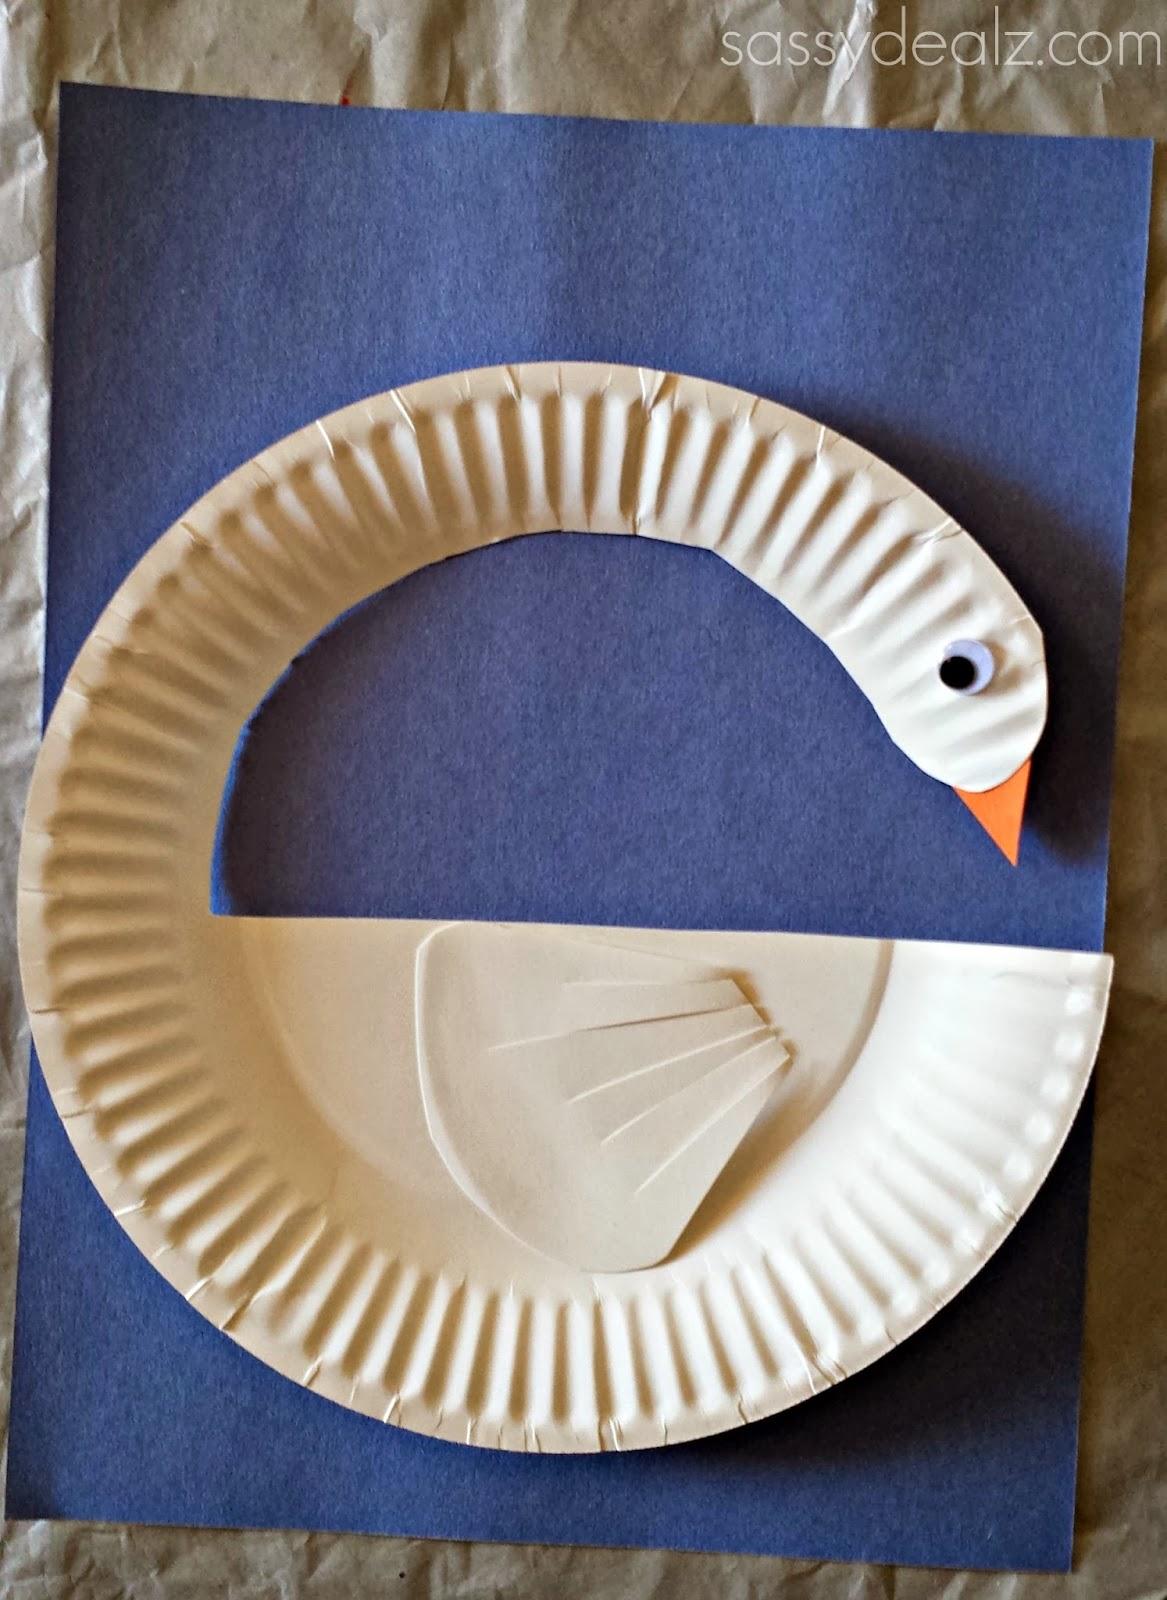 Paper Crafts For Kids: DIY Swan Paper Plate Craft For Kids